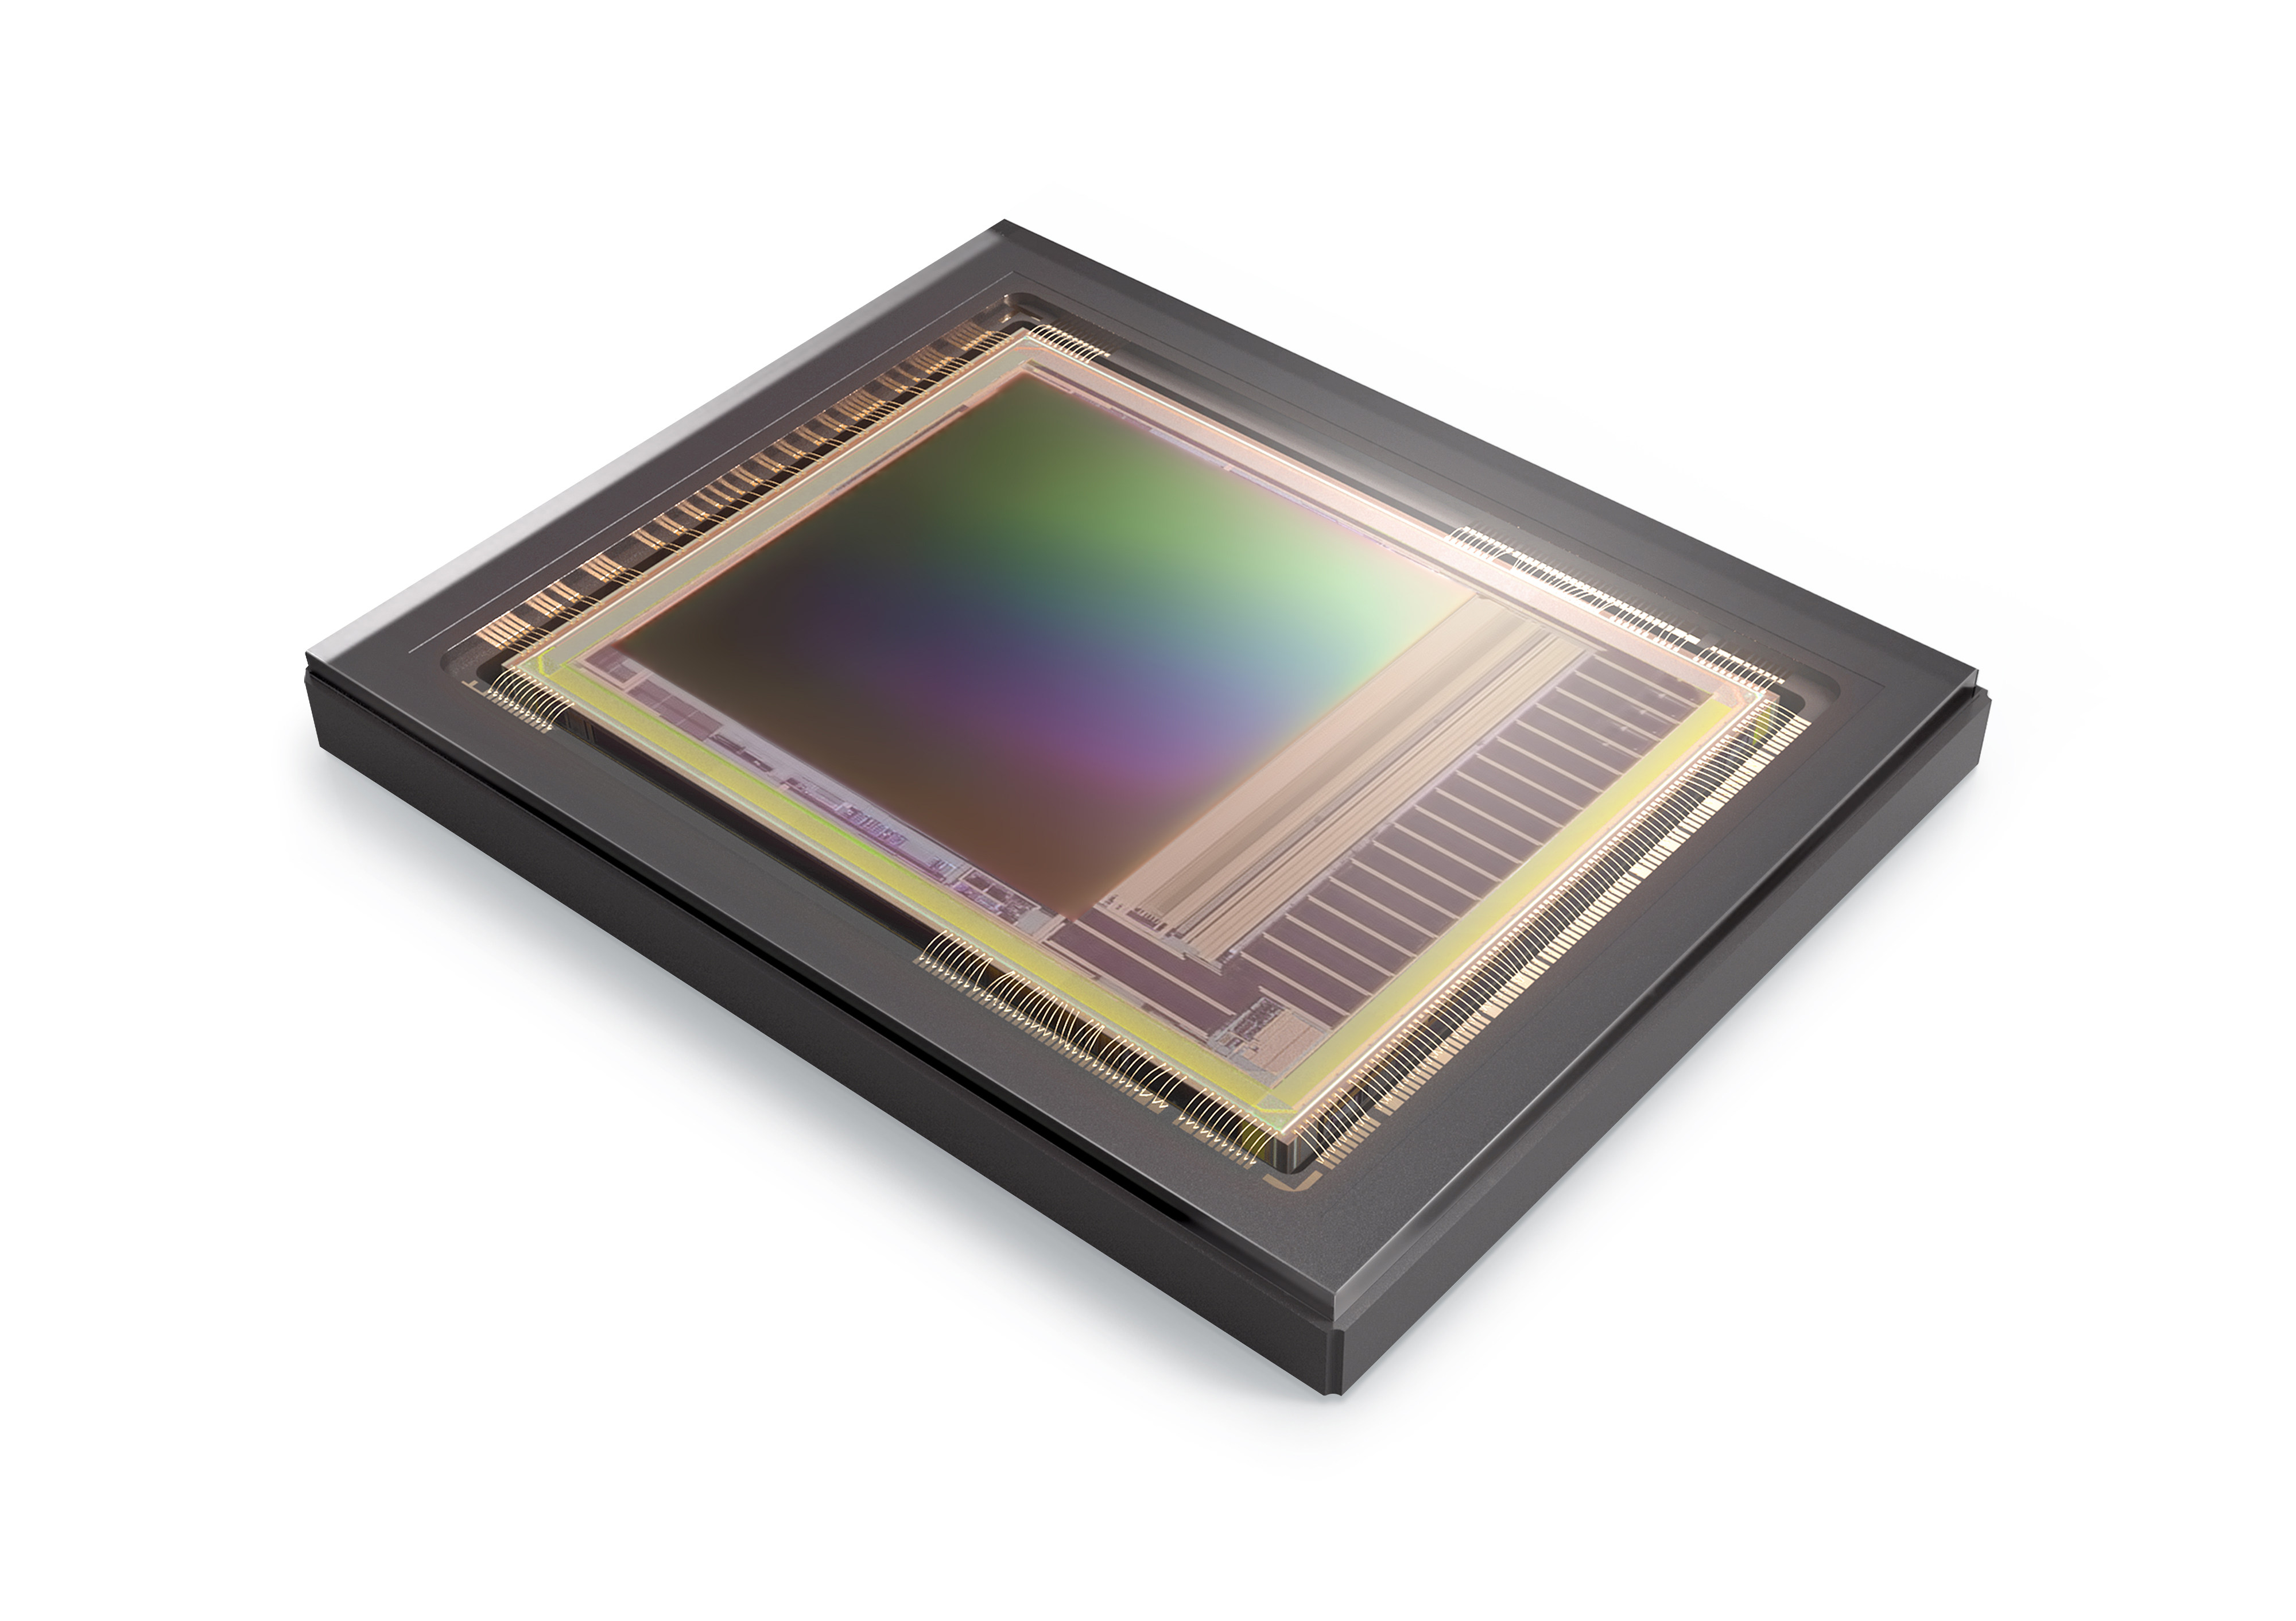 e2v正式发布Emerald系列新CMOS图像传感器